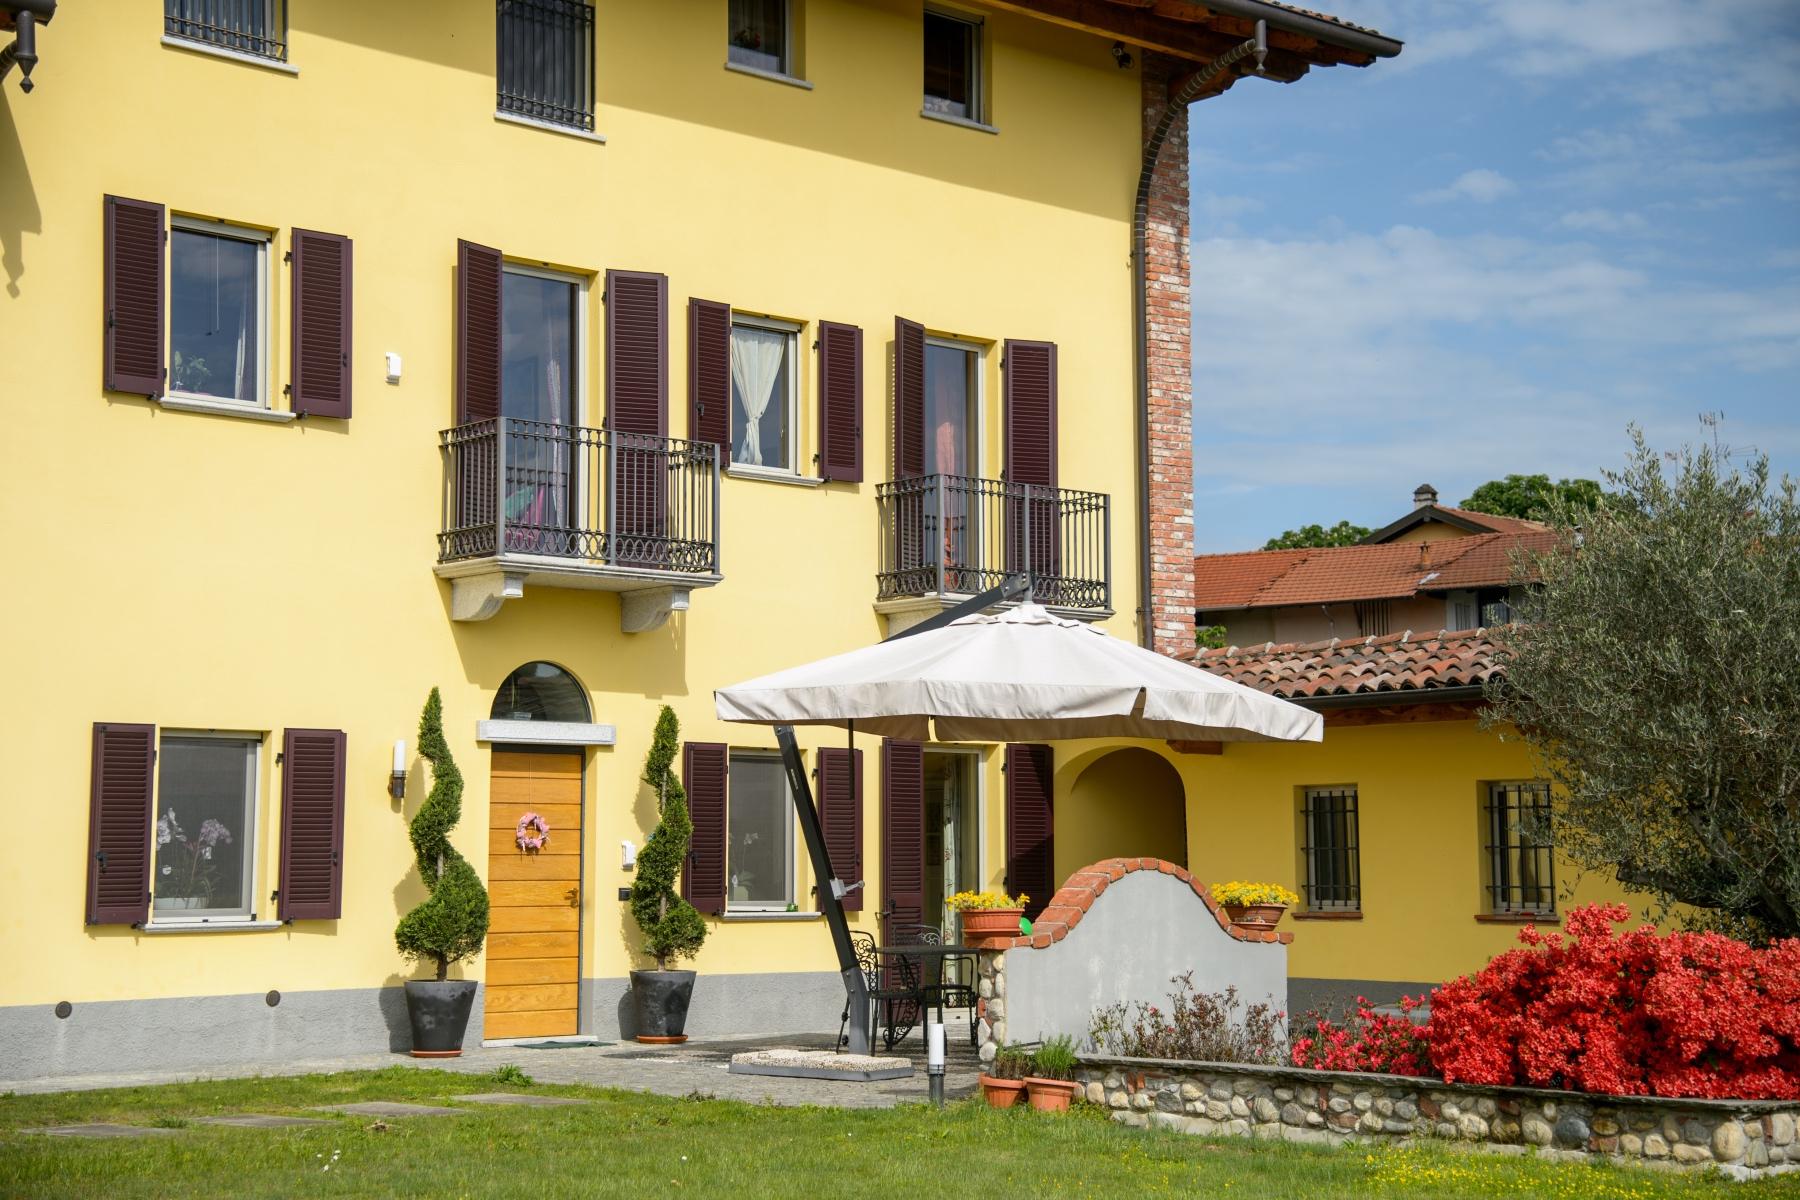 Casa indipendente in Vendita a Agrate Conturbia: 5 locali, 400 mq - Foto 20